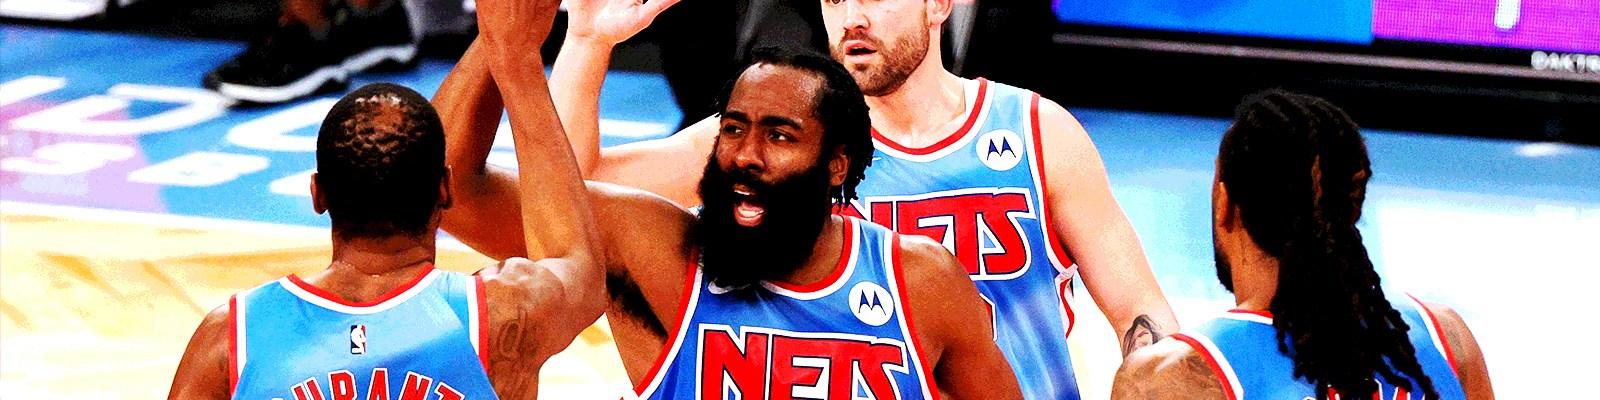 NBA Power Rankings Week 21: A Final Look Before The Playoffs